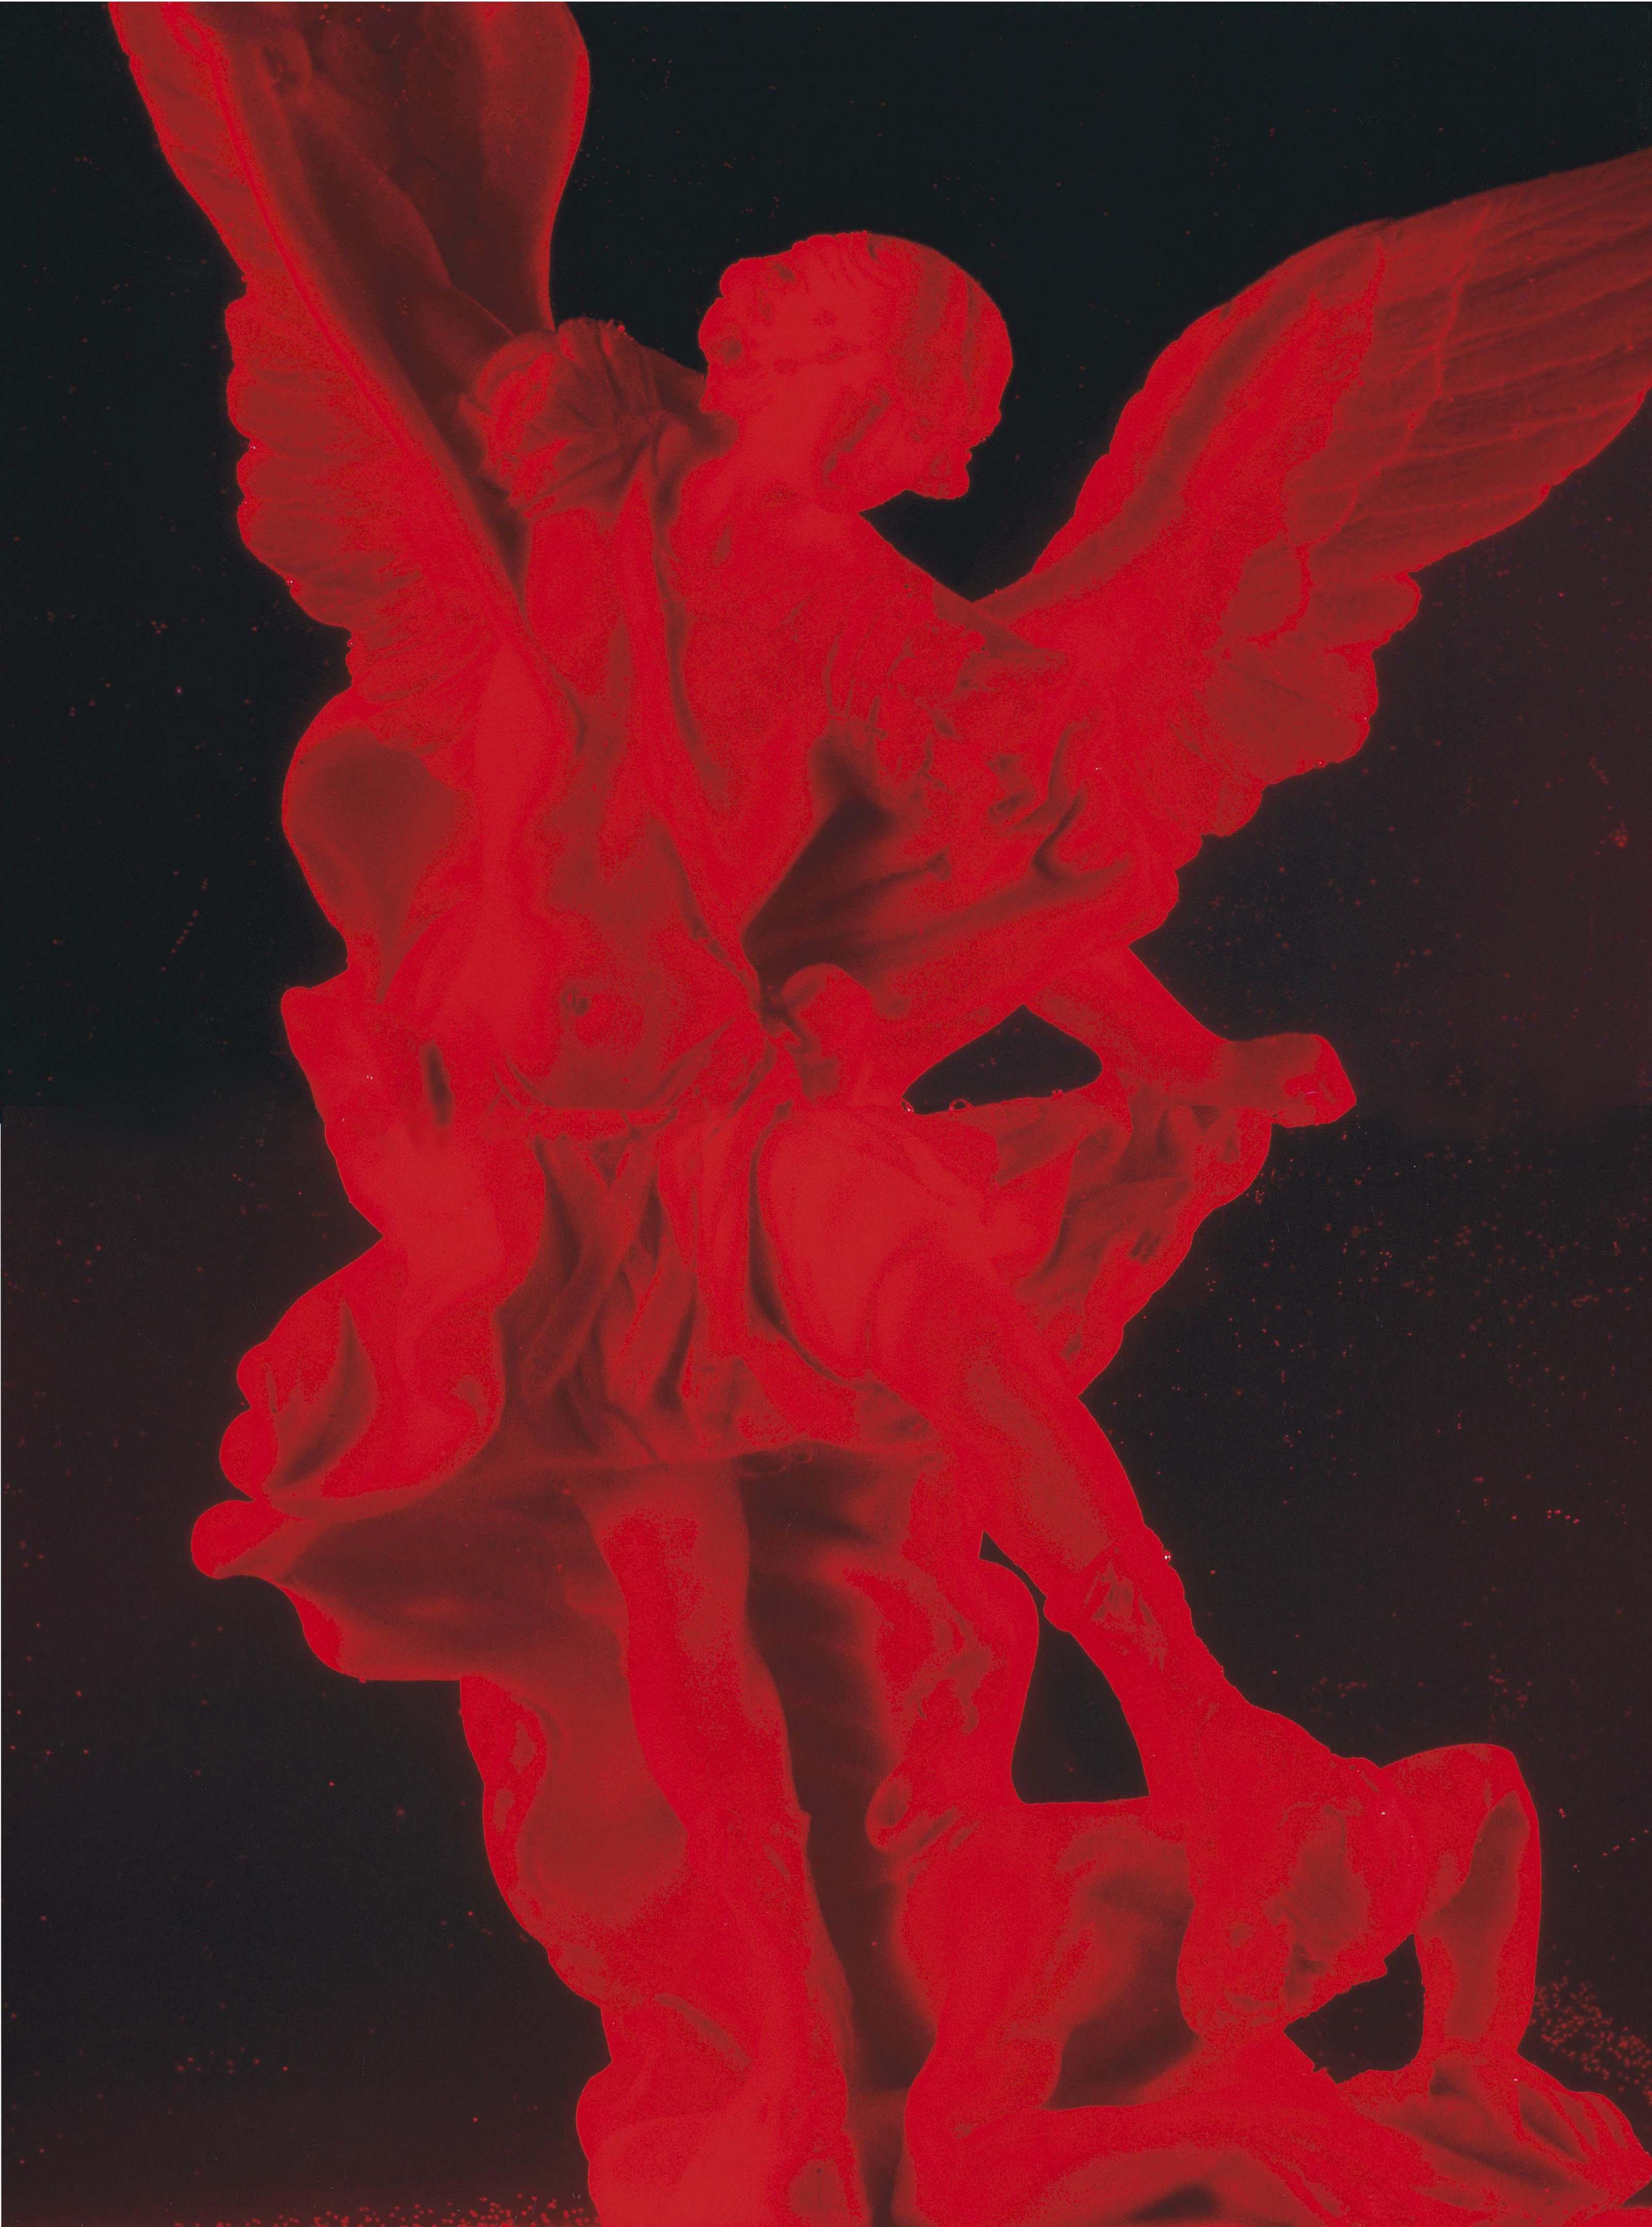 St. Michael's Blood